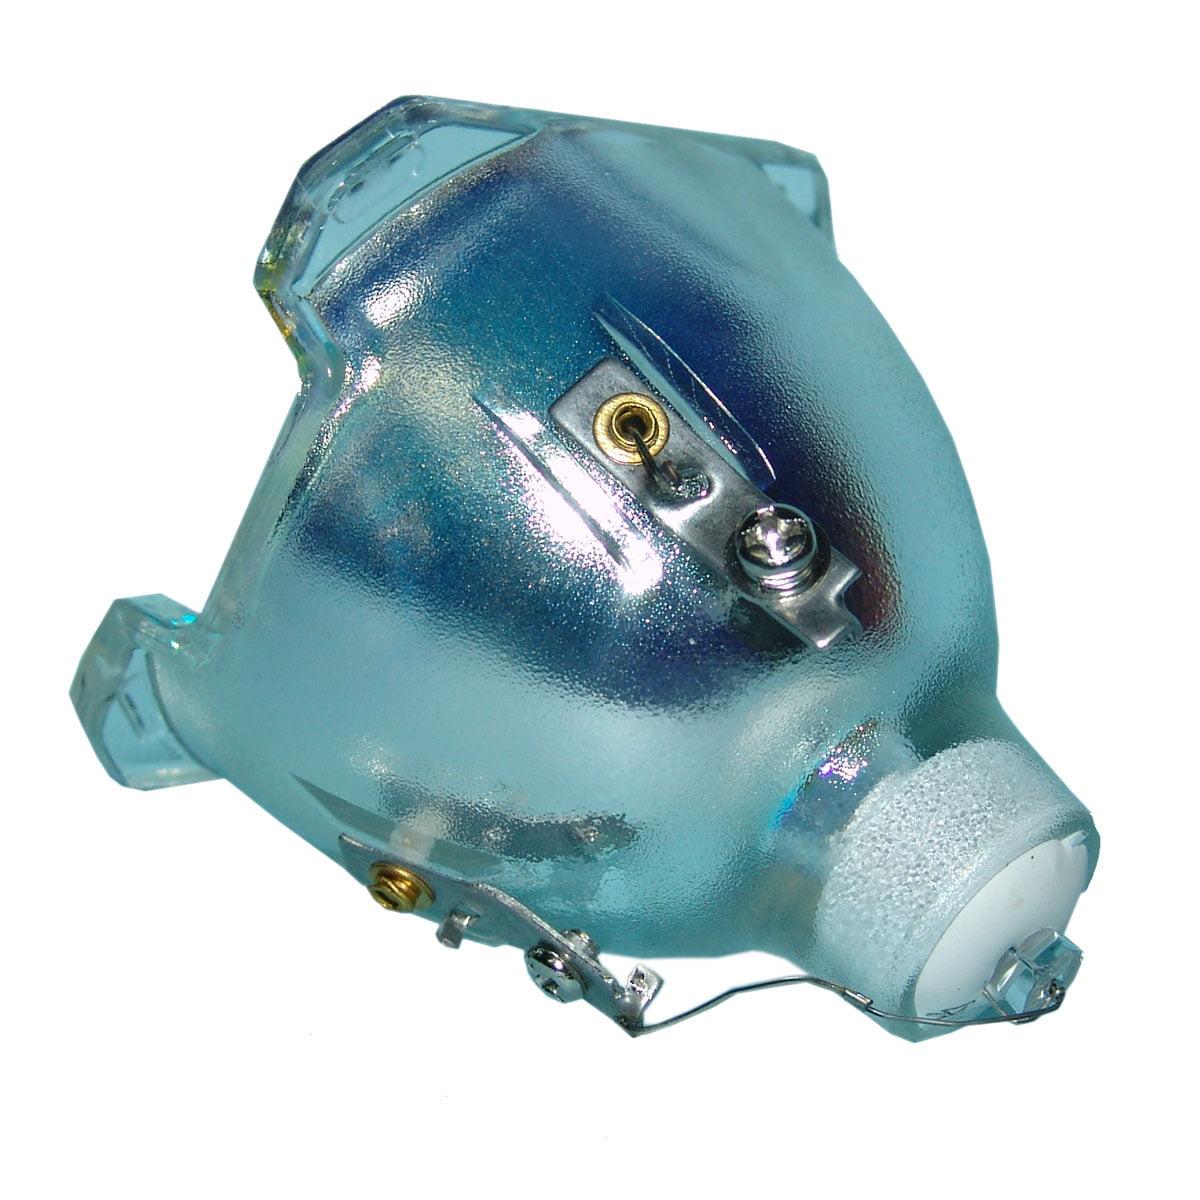 Lutema Platinum Bulb for Runco VideoXtreme VX-2i Projector Lamp (Original Philips Inside) - image 2 of 5